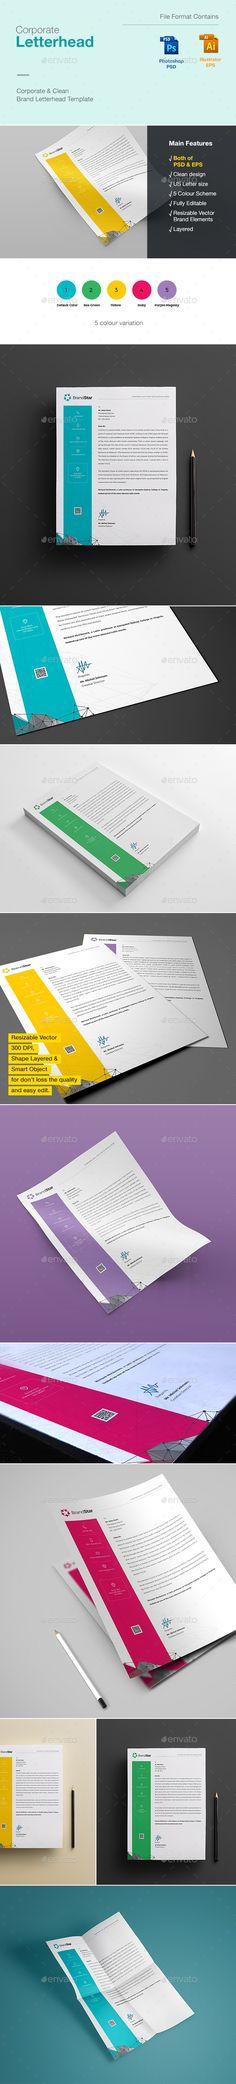 agency proposal template%0A Siska Proposal Template   Proposal templates  Proposals and Business  proposal